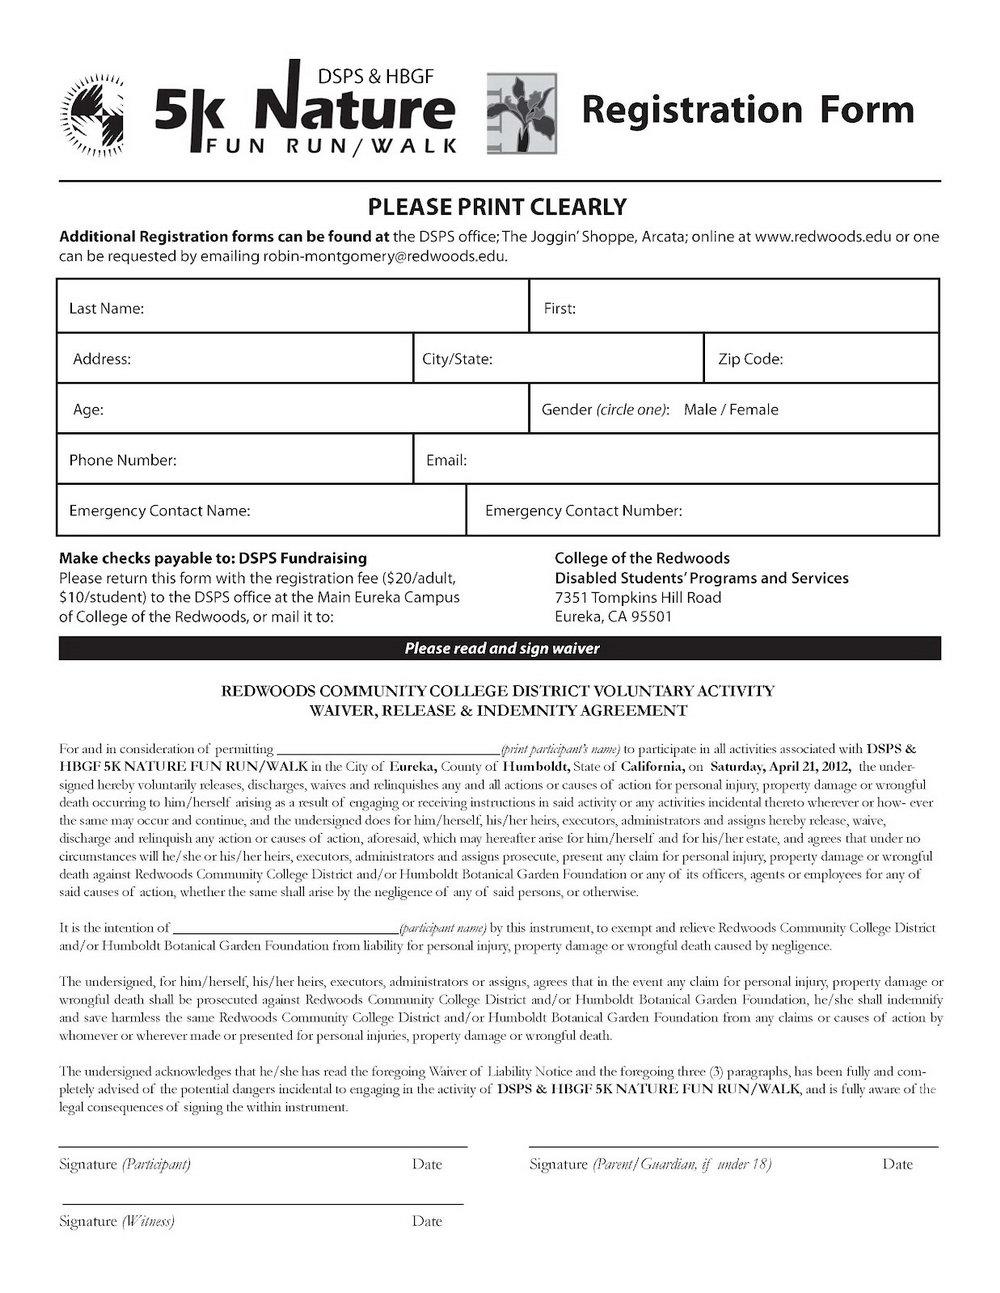 5k Race Registration Form Template